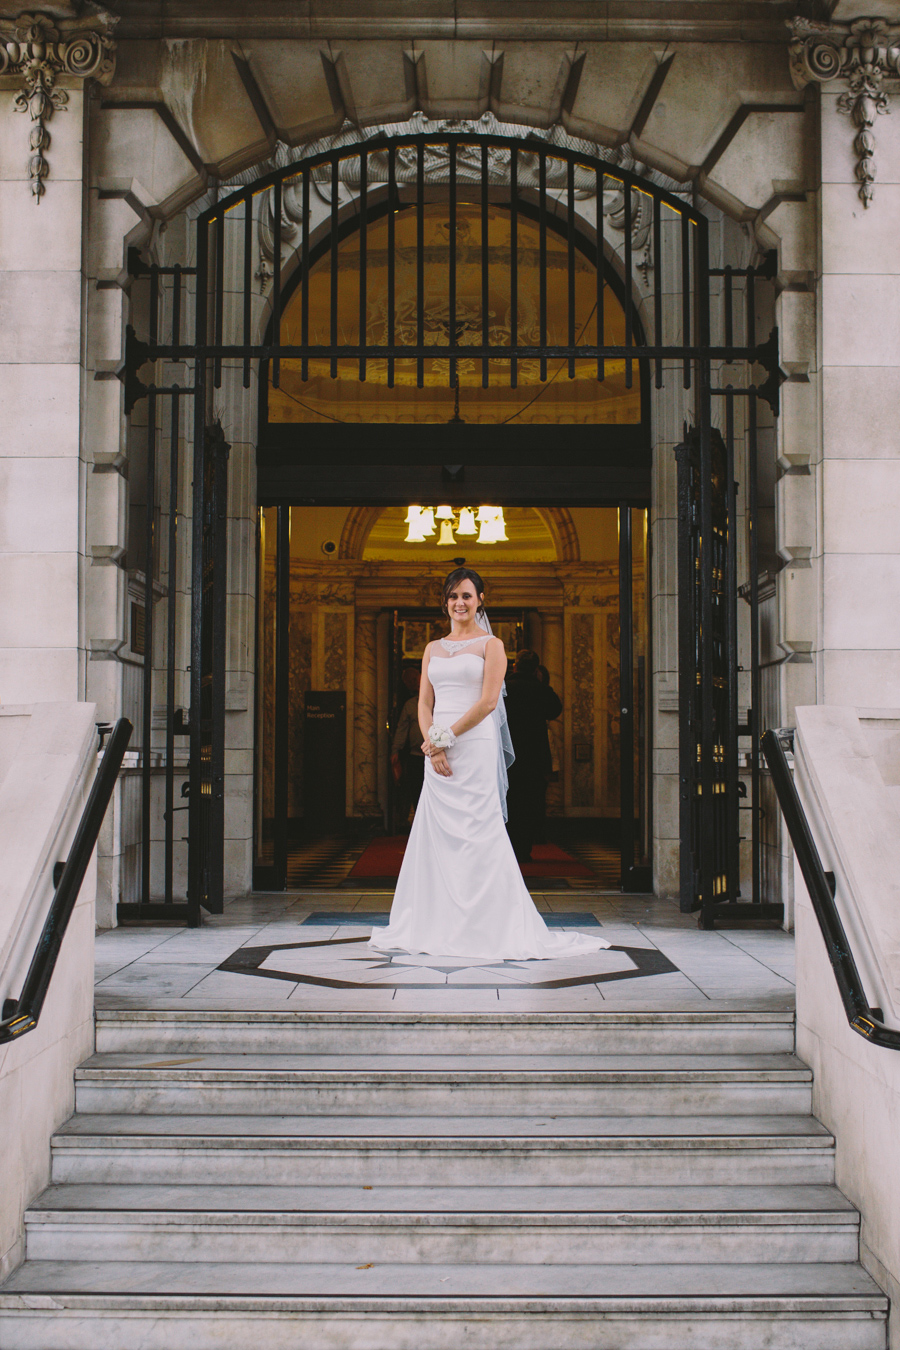 Wedding Photography Northern Ireland, bride at Belfast City Hall entrance, Belfast County Antrim, Ireland.